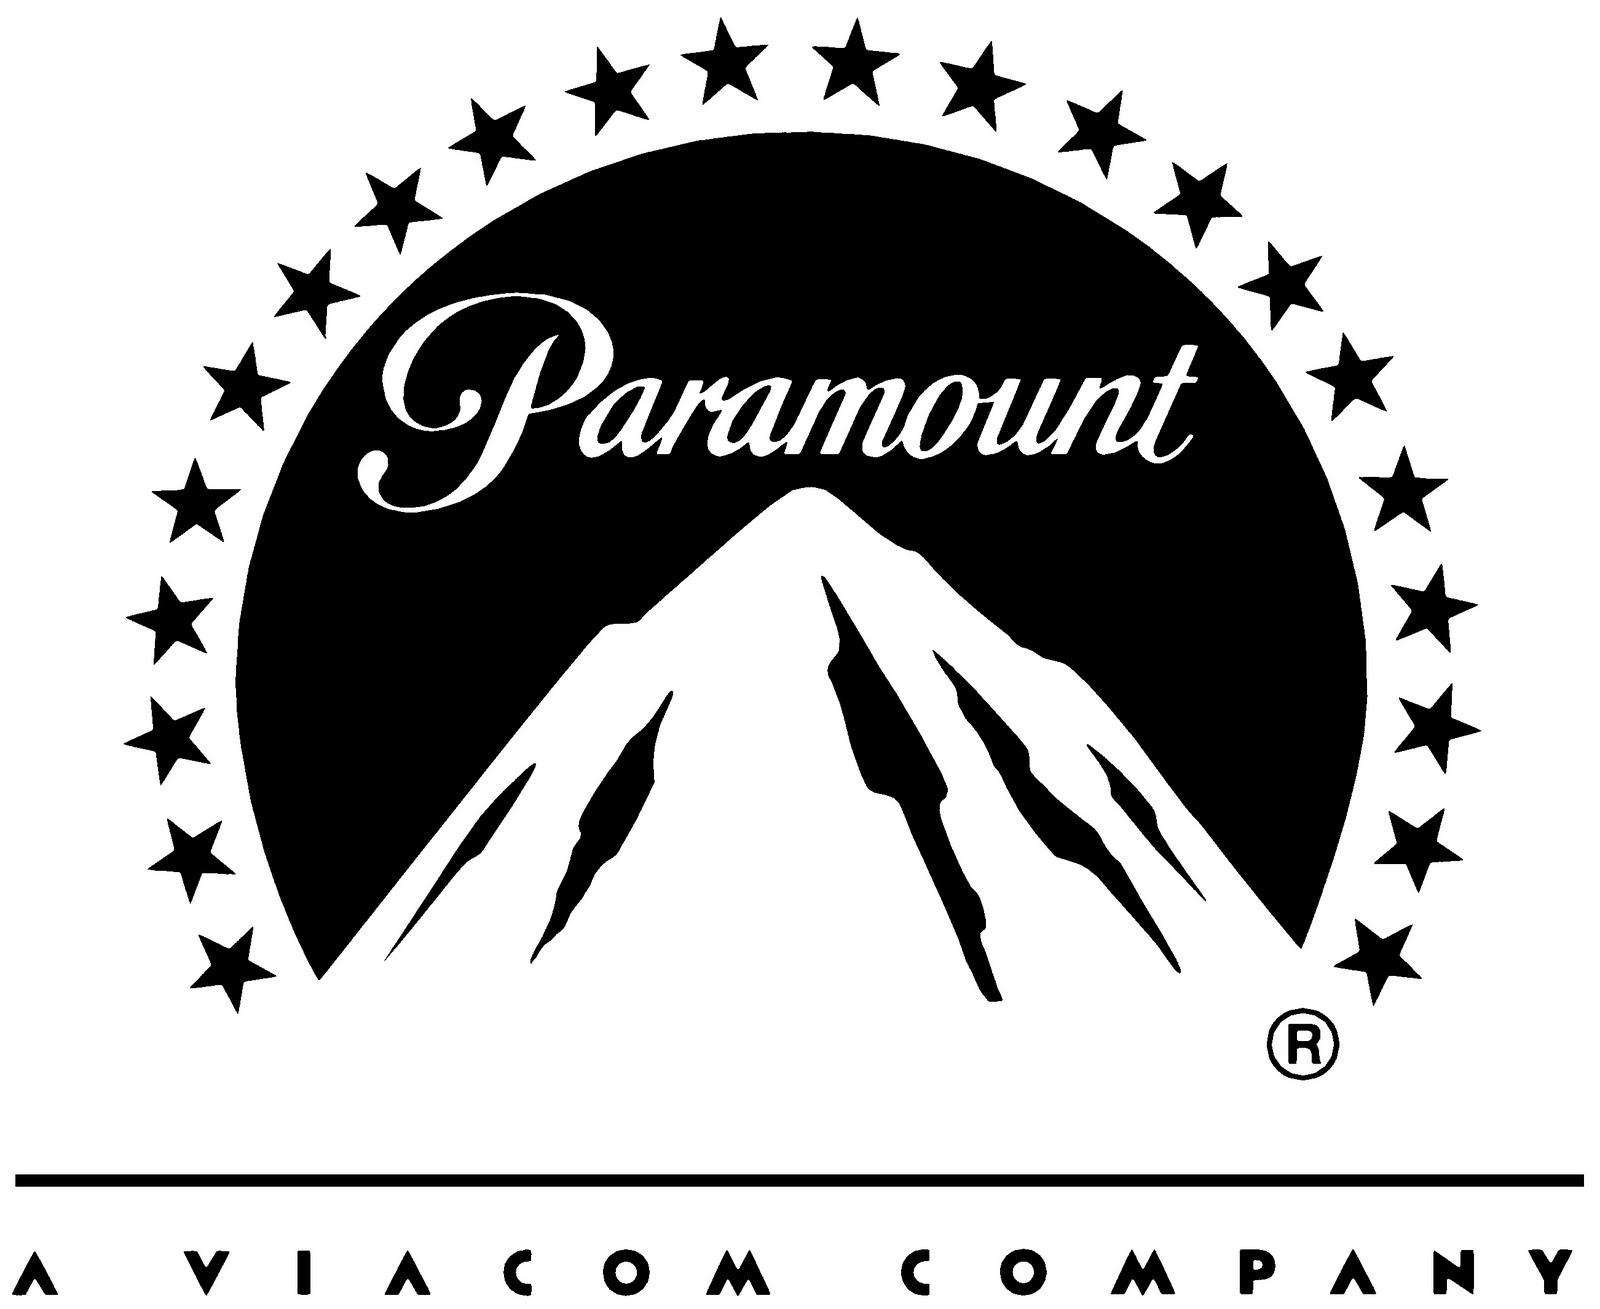 paramount logo black and white - photo #2